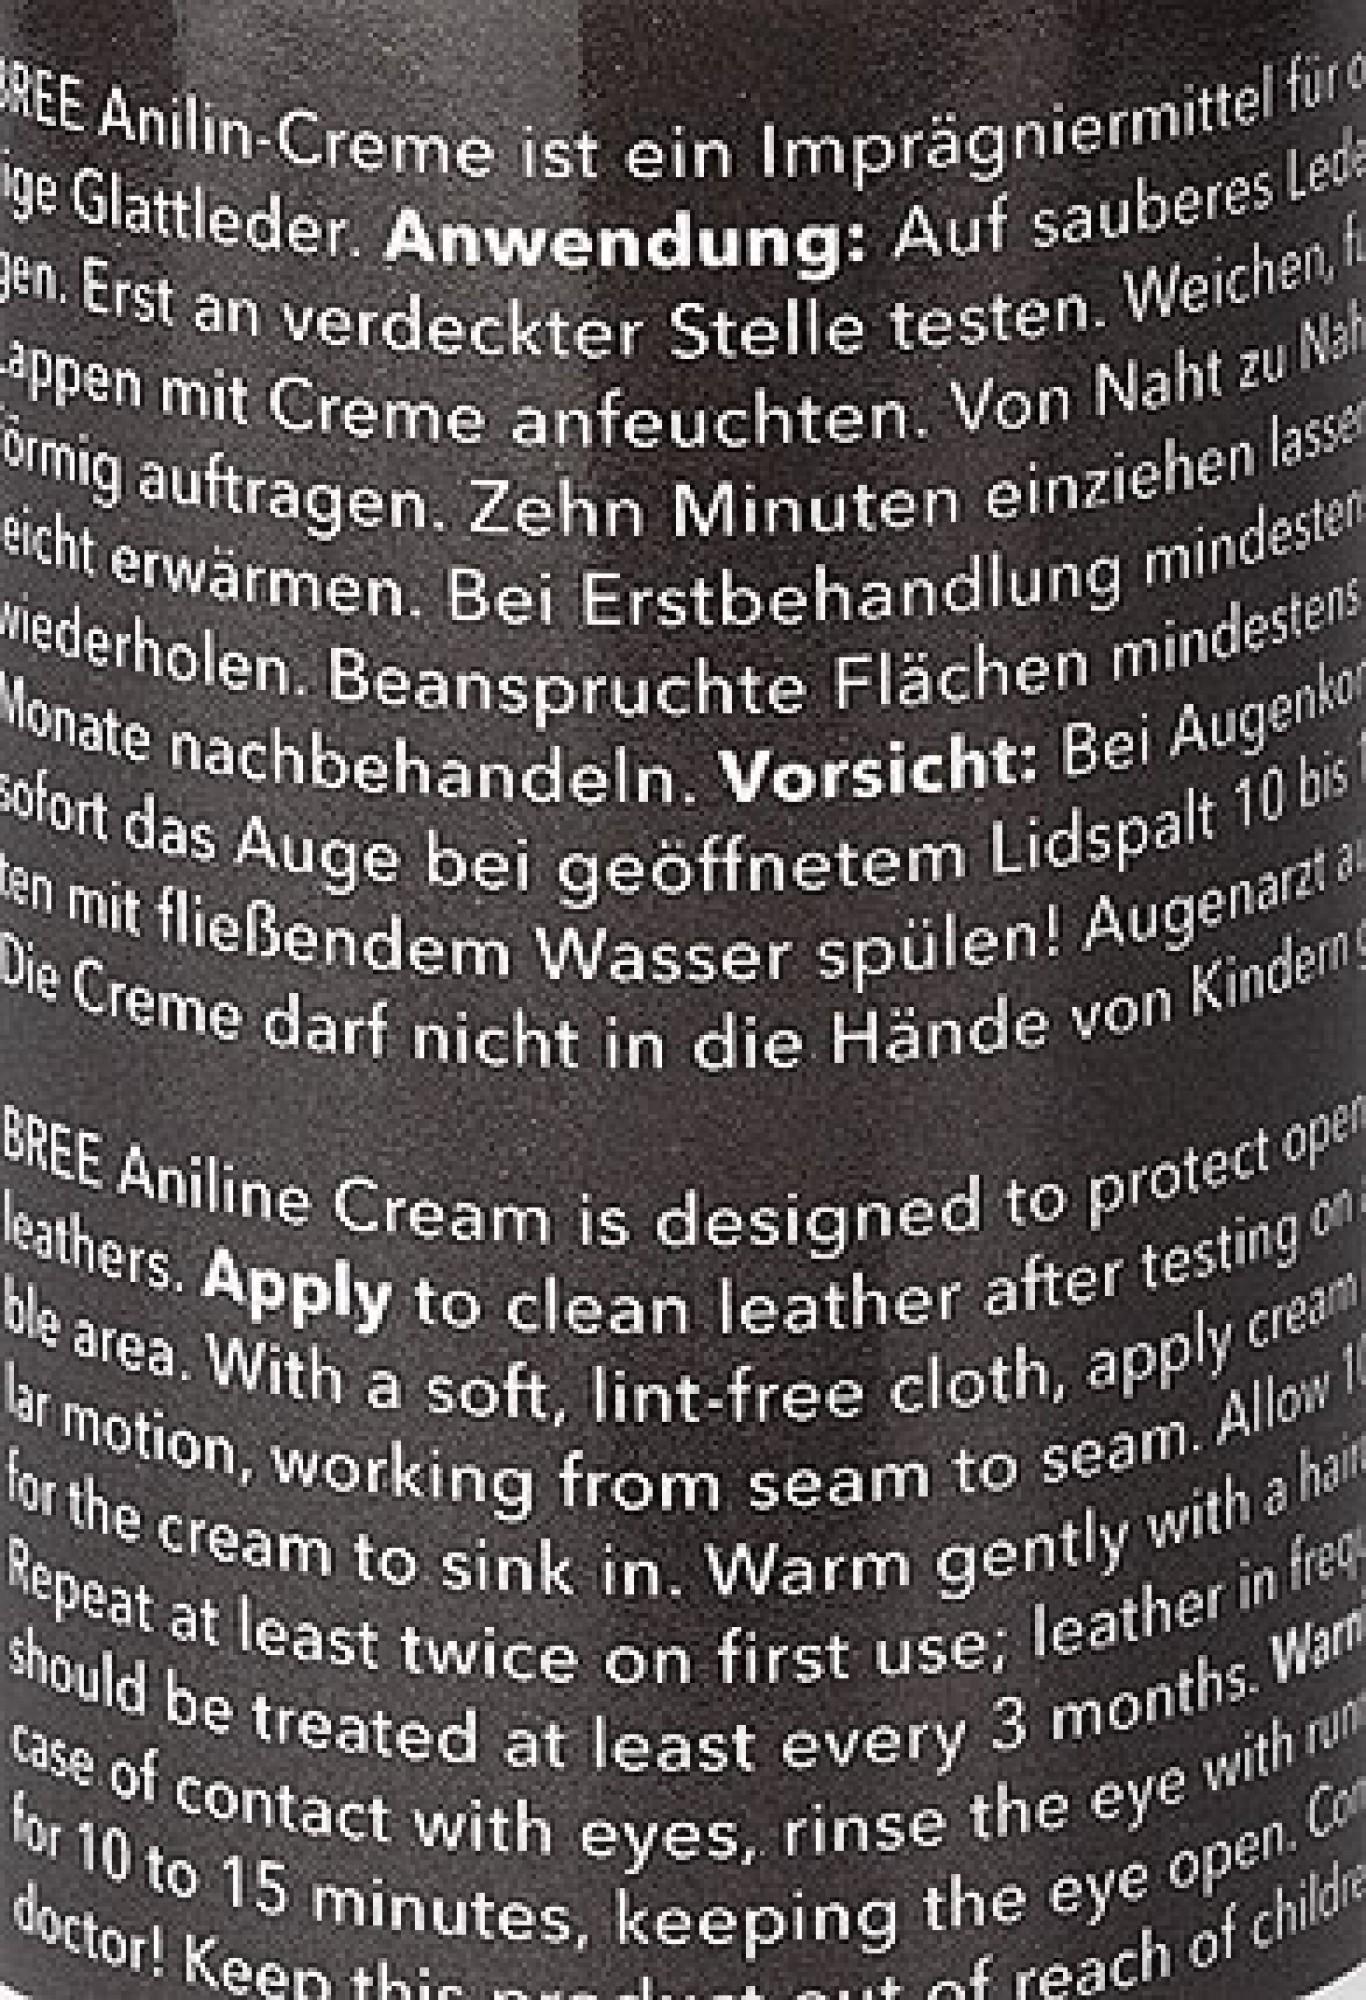 Aniline Cream